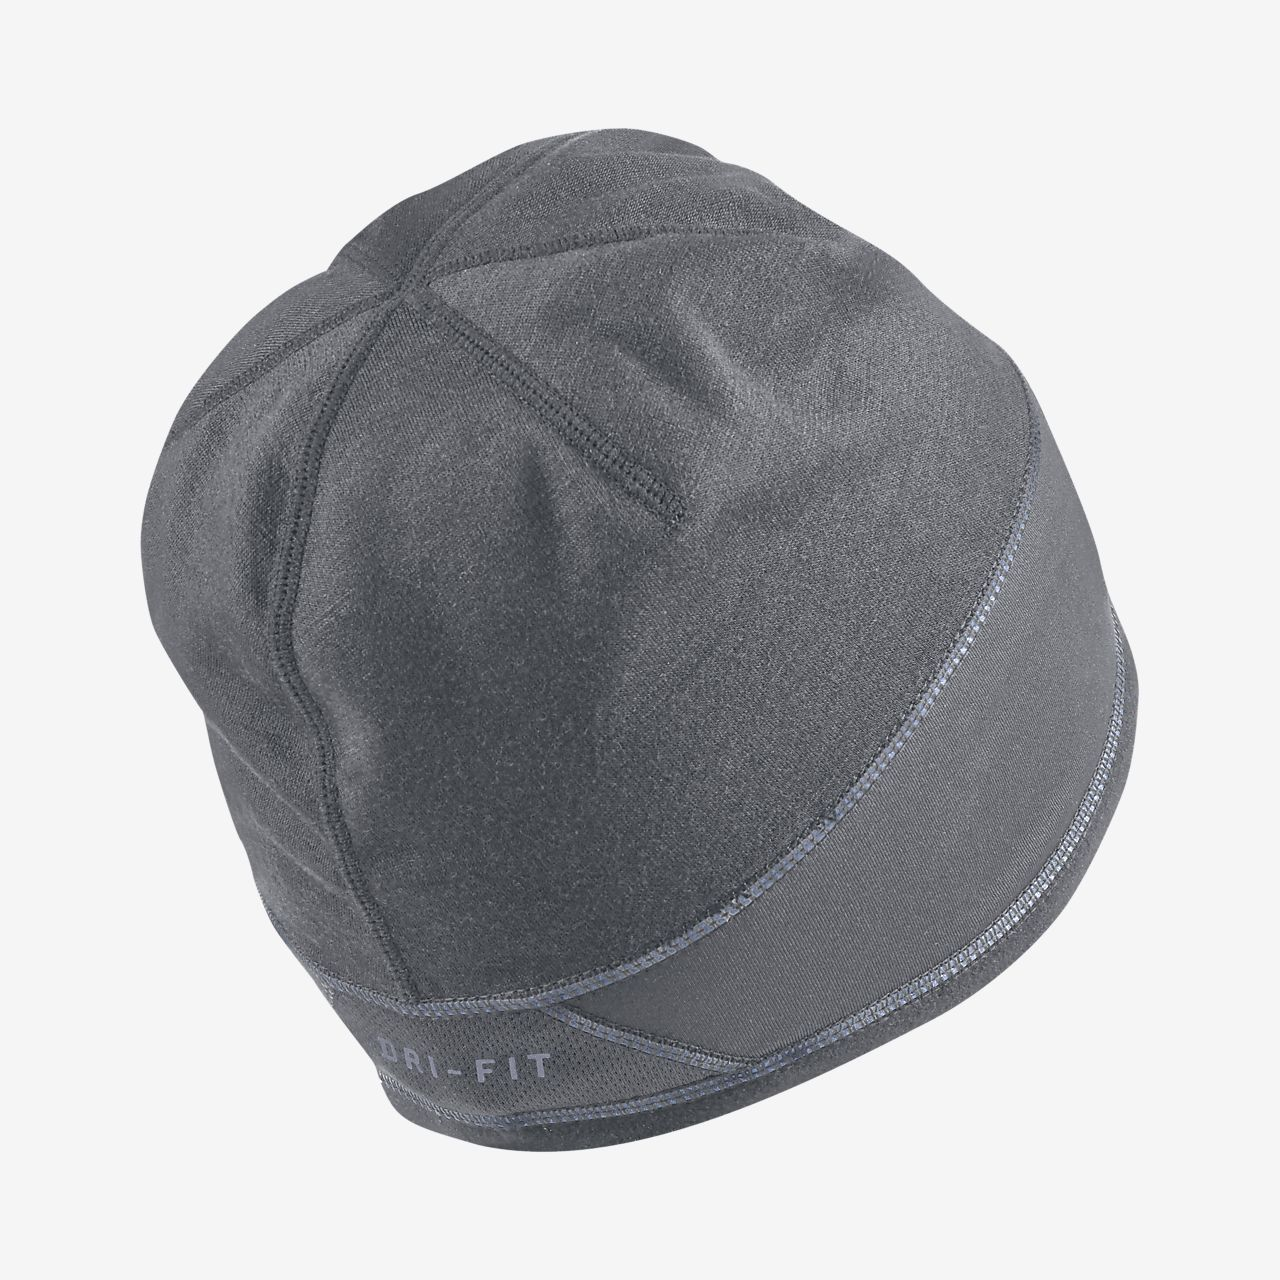 Acquista cappello running nike - OFF48% sconti 0df3806029f3